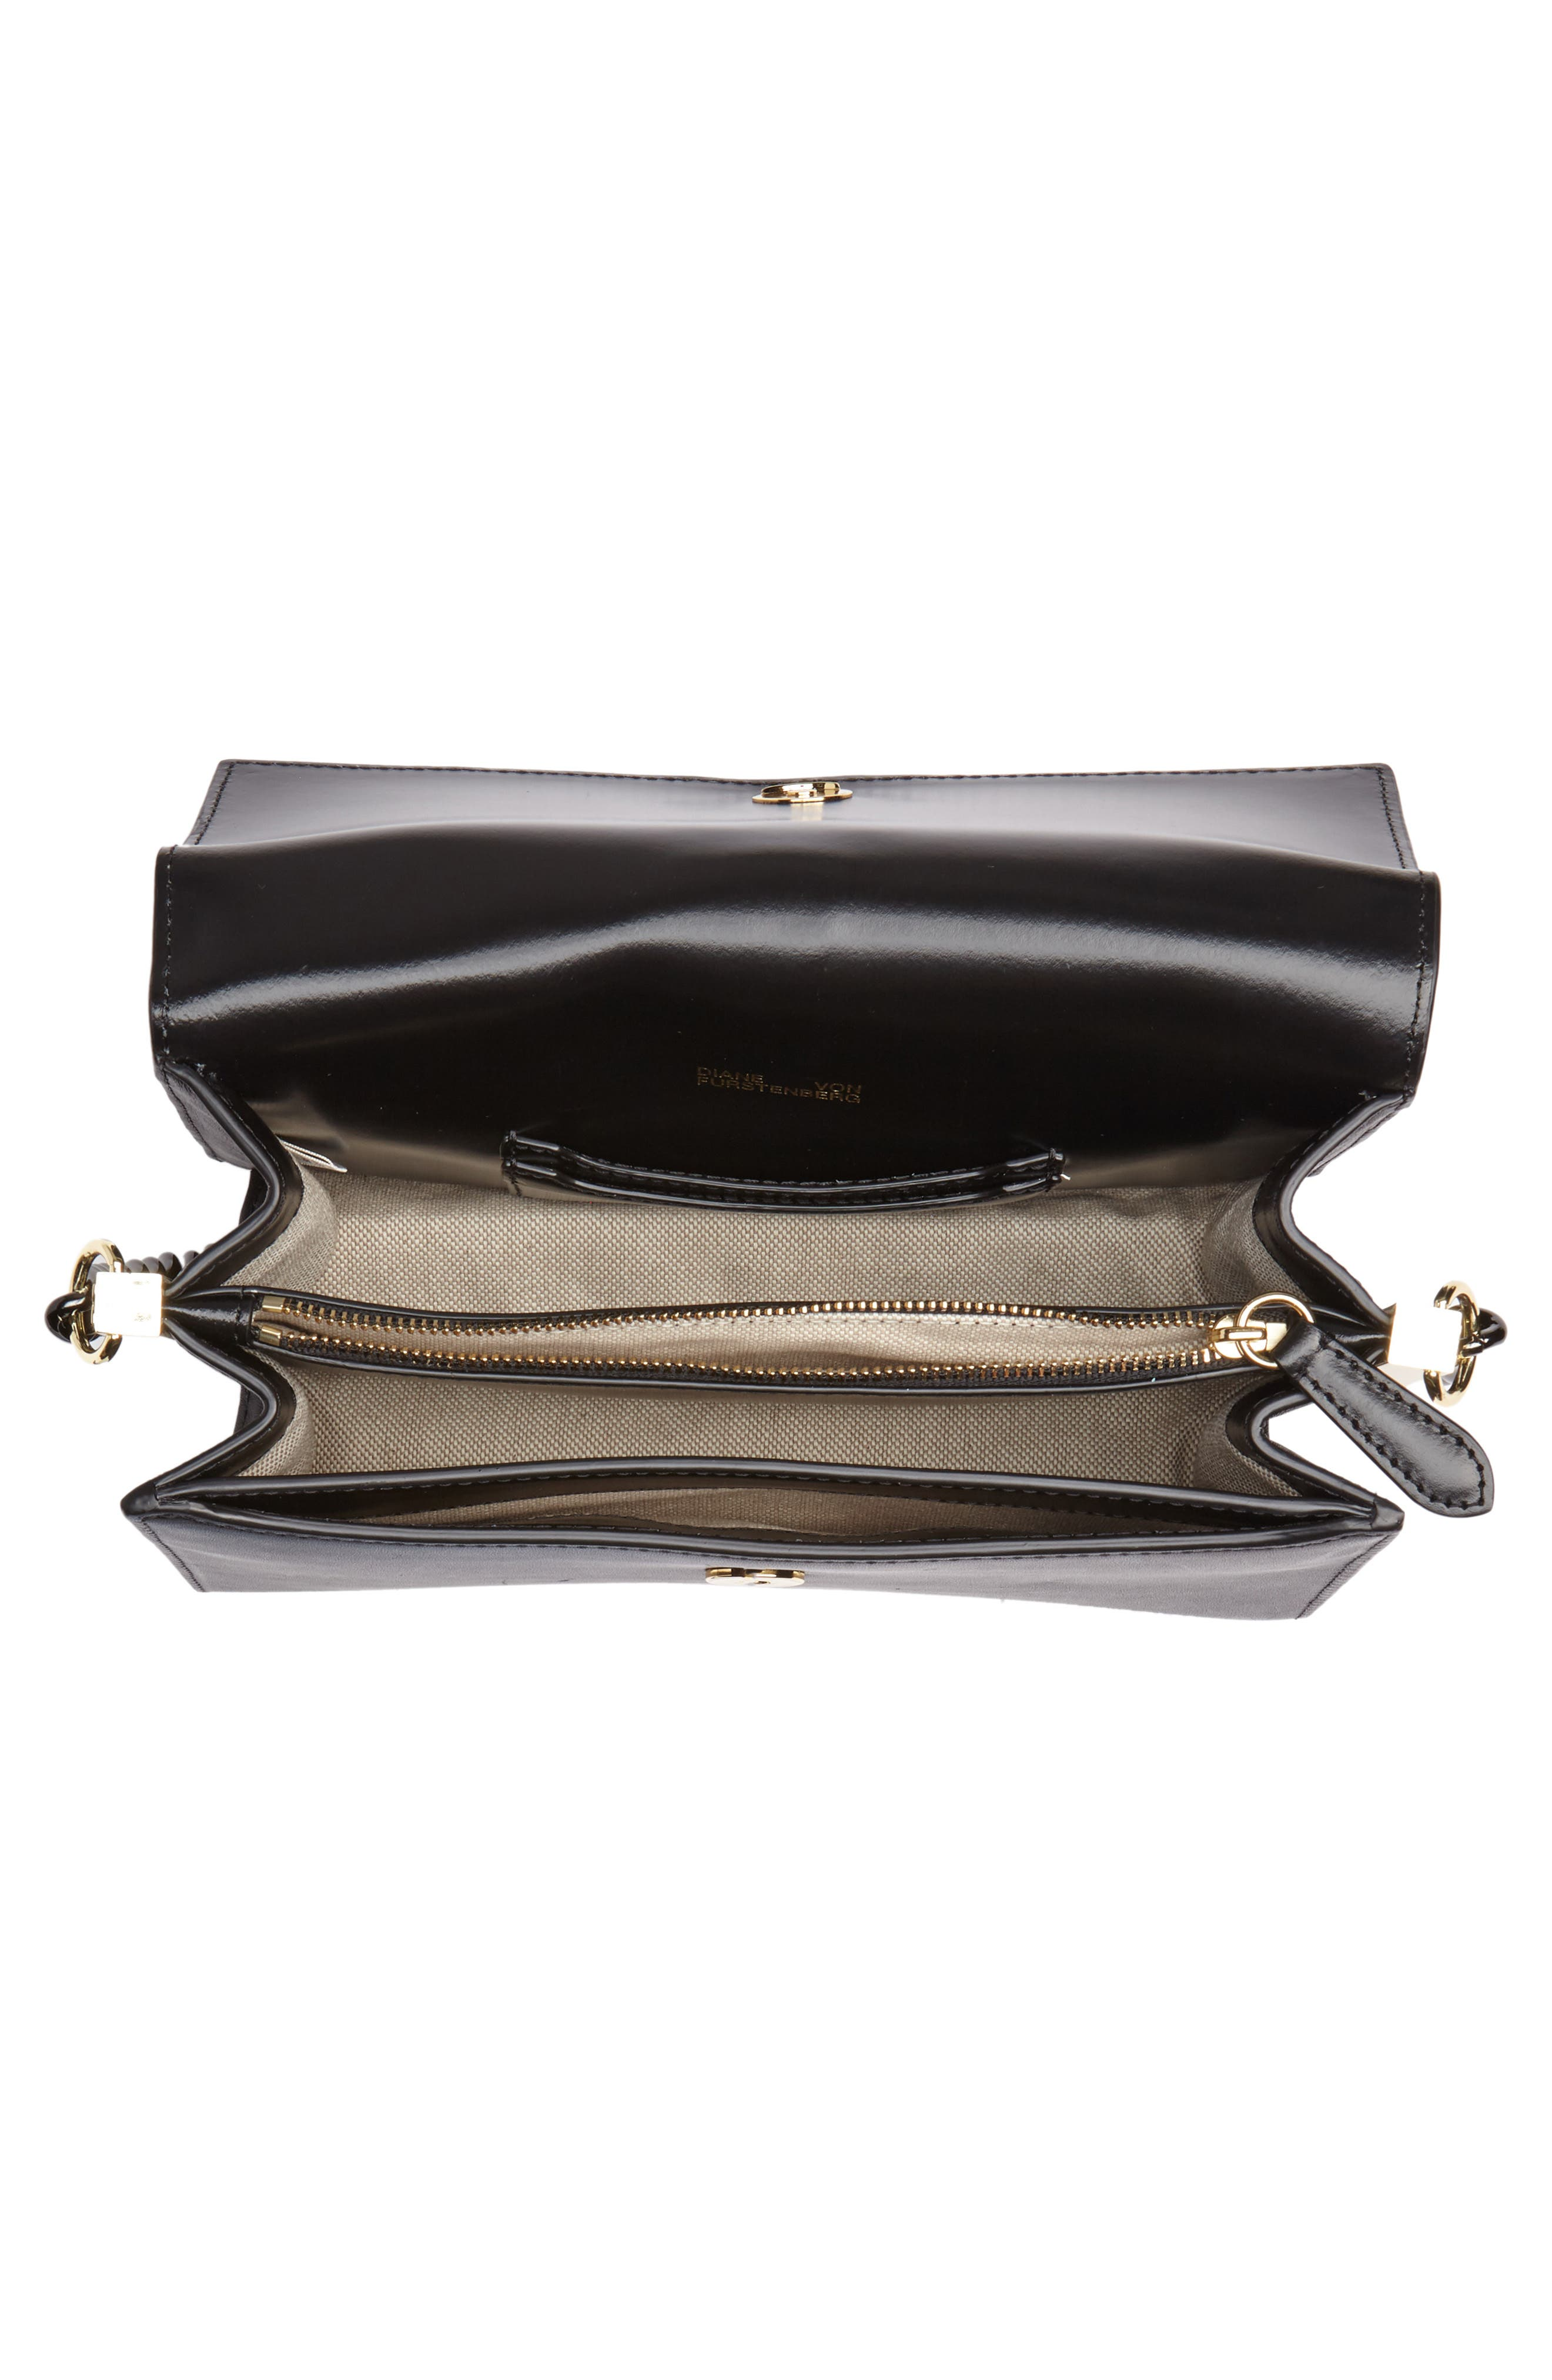 Bonne Journée Leather & Genuine Snakeskin Crossbody Bag,                             Alternate thumbnail 4, color,                             Black